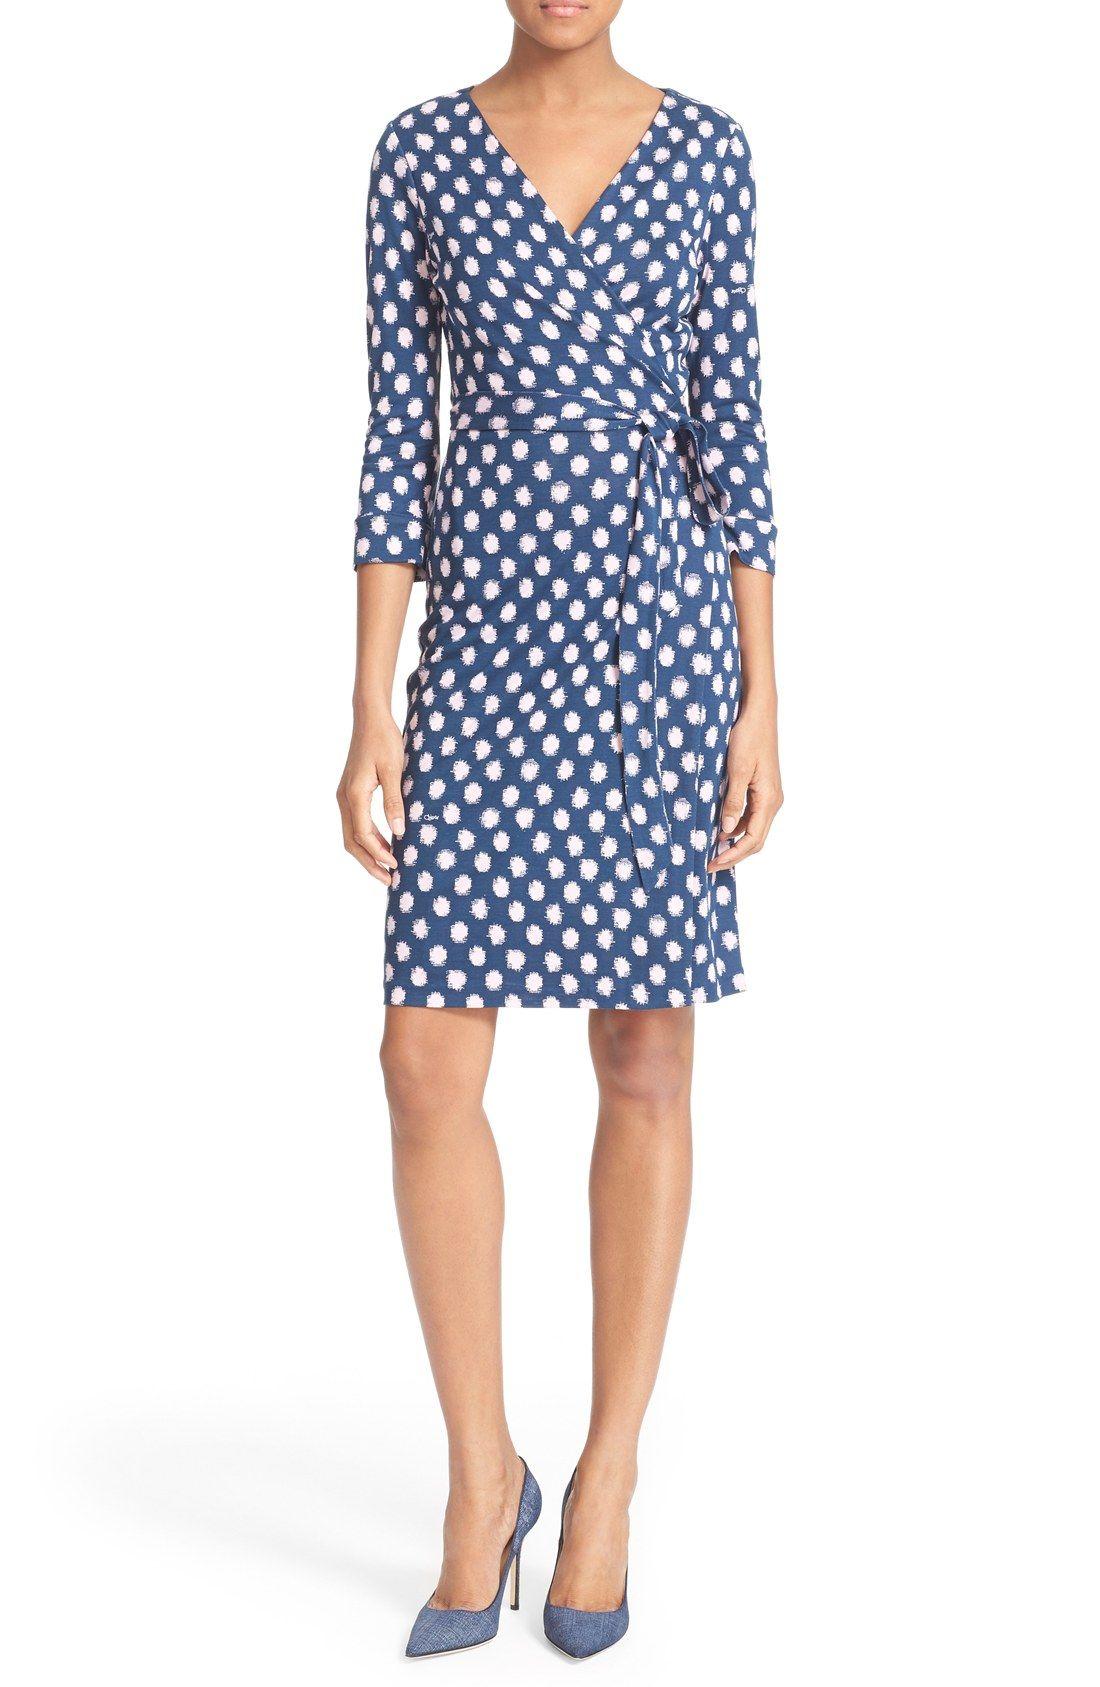 Diane Von Furstenberg New Julian Two Polka Dot Silk Wrap Dress Nordstrom Exclusive Nordstrom Wrap Dress Silk Wrap Dresses Work Dresses For Women [ 1687 x 1100 Pixel ]